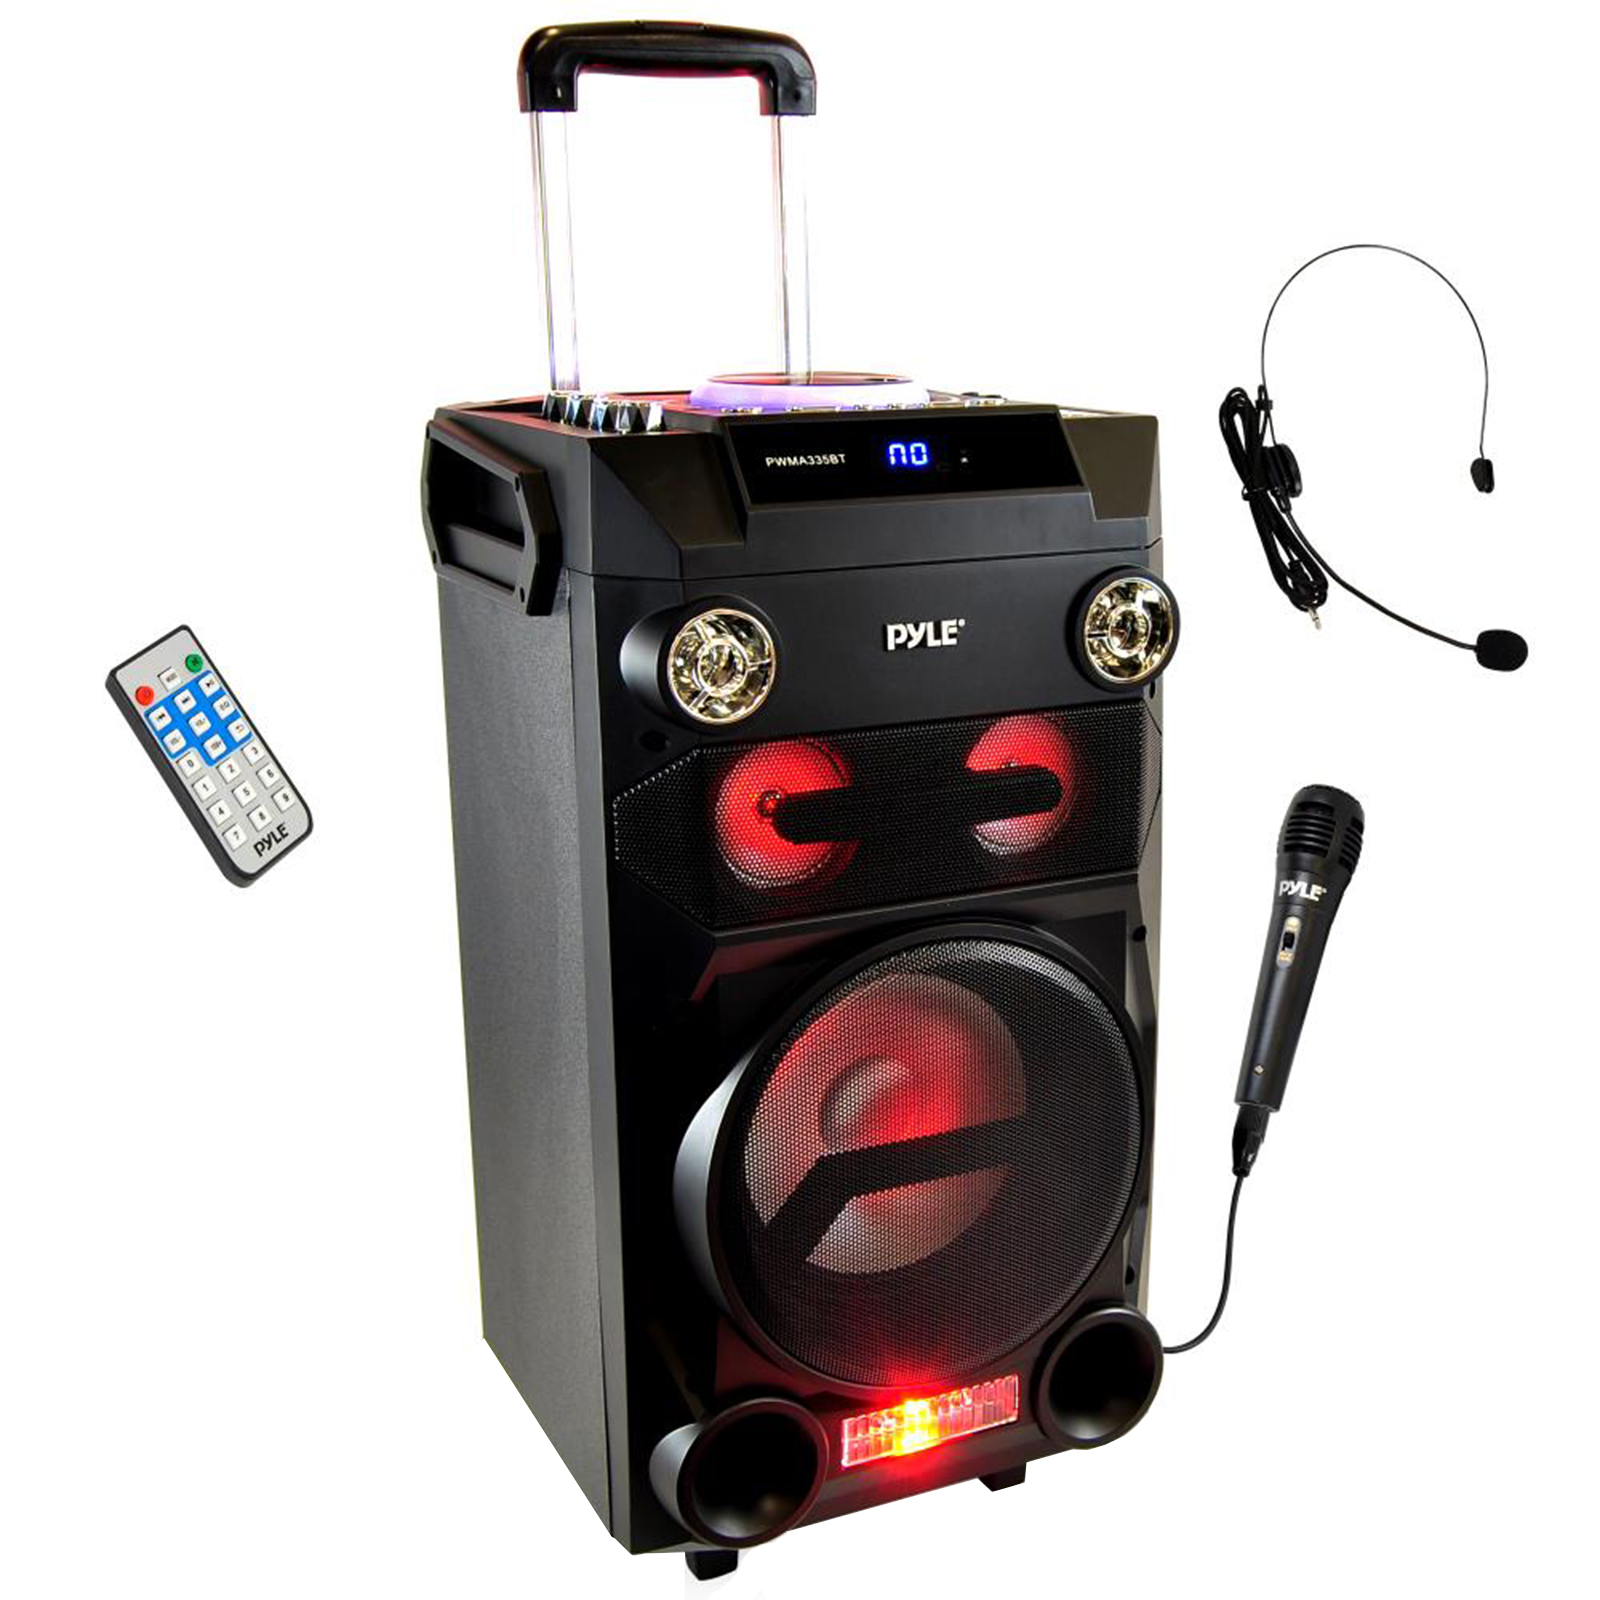 Portable BT Karaoke Speaker System PA Loudspeaker with Flashing DJ Lights, Built-in... by Pyle